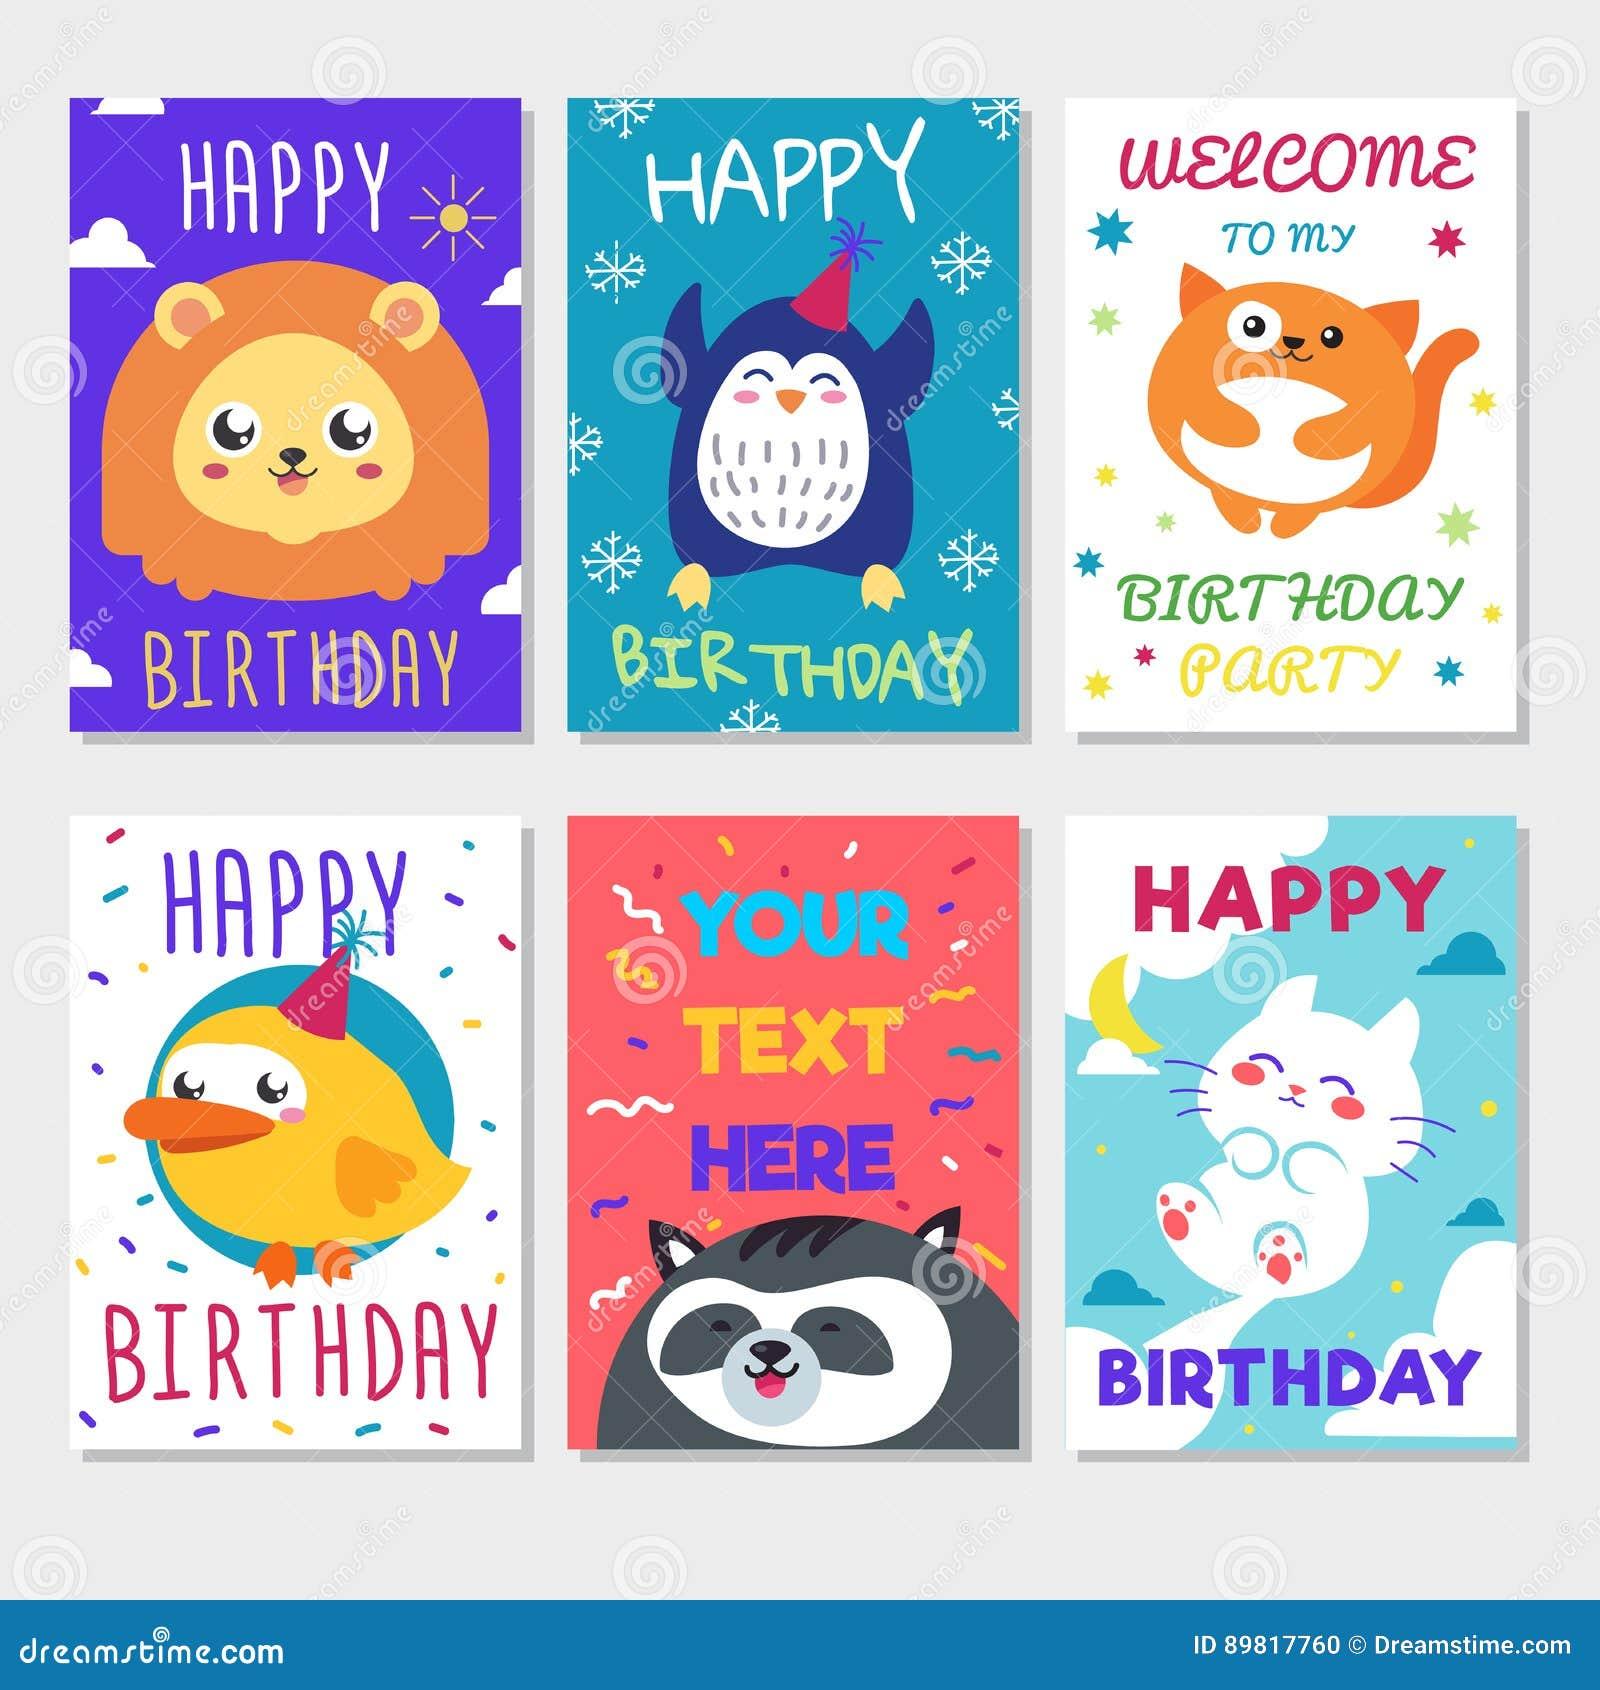 Happy Birthday Holiday Card With Cute Animals Cartoon Vector